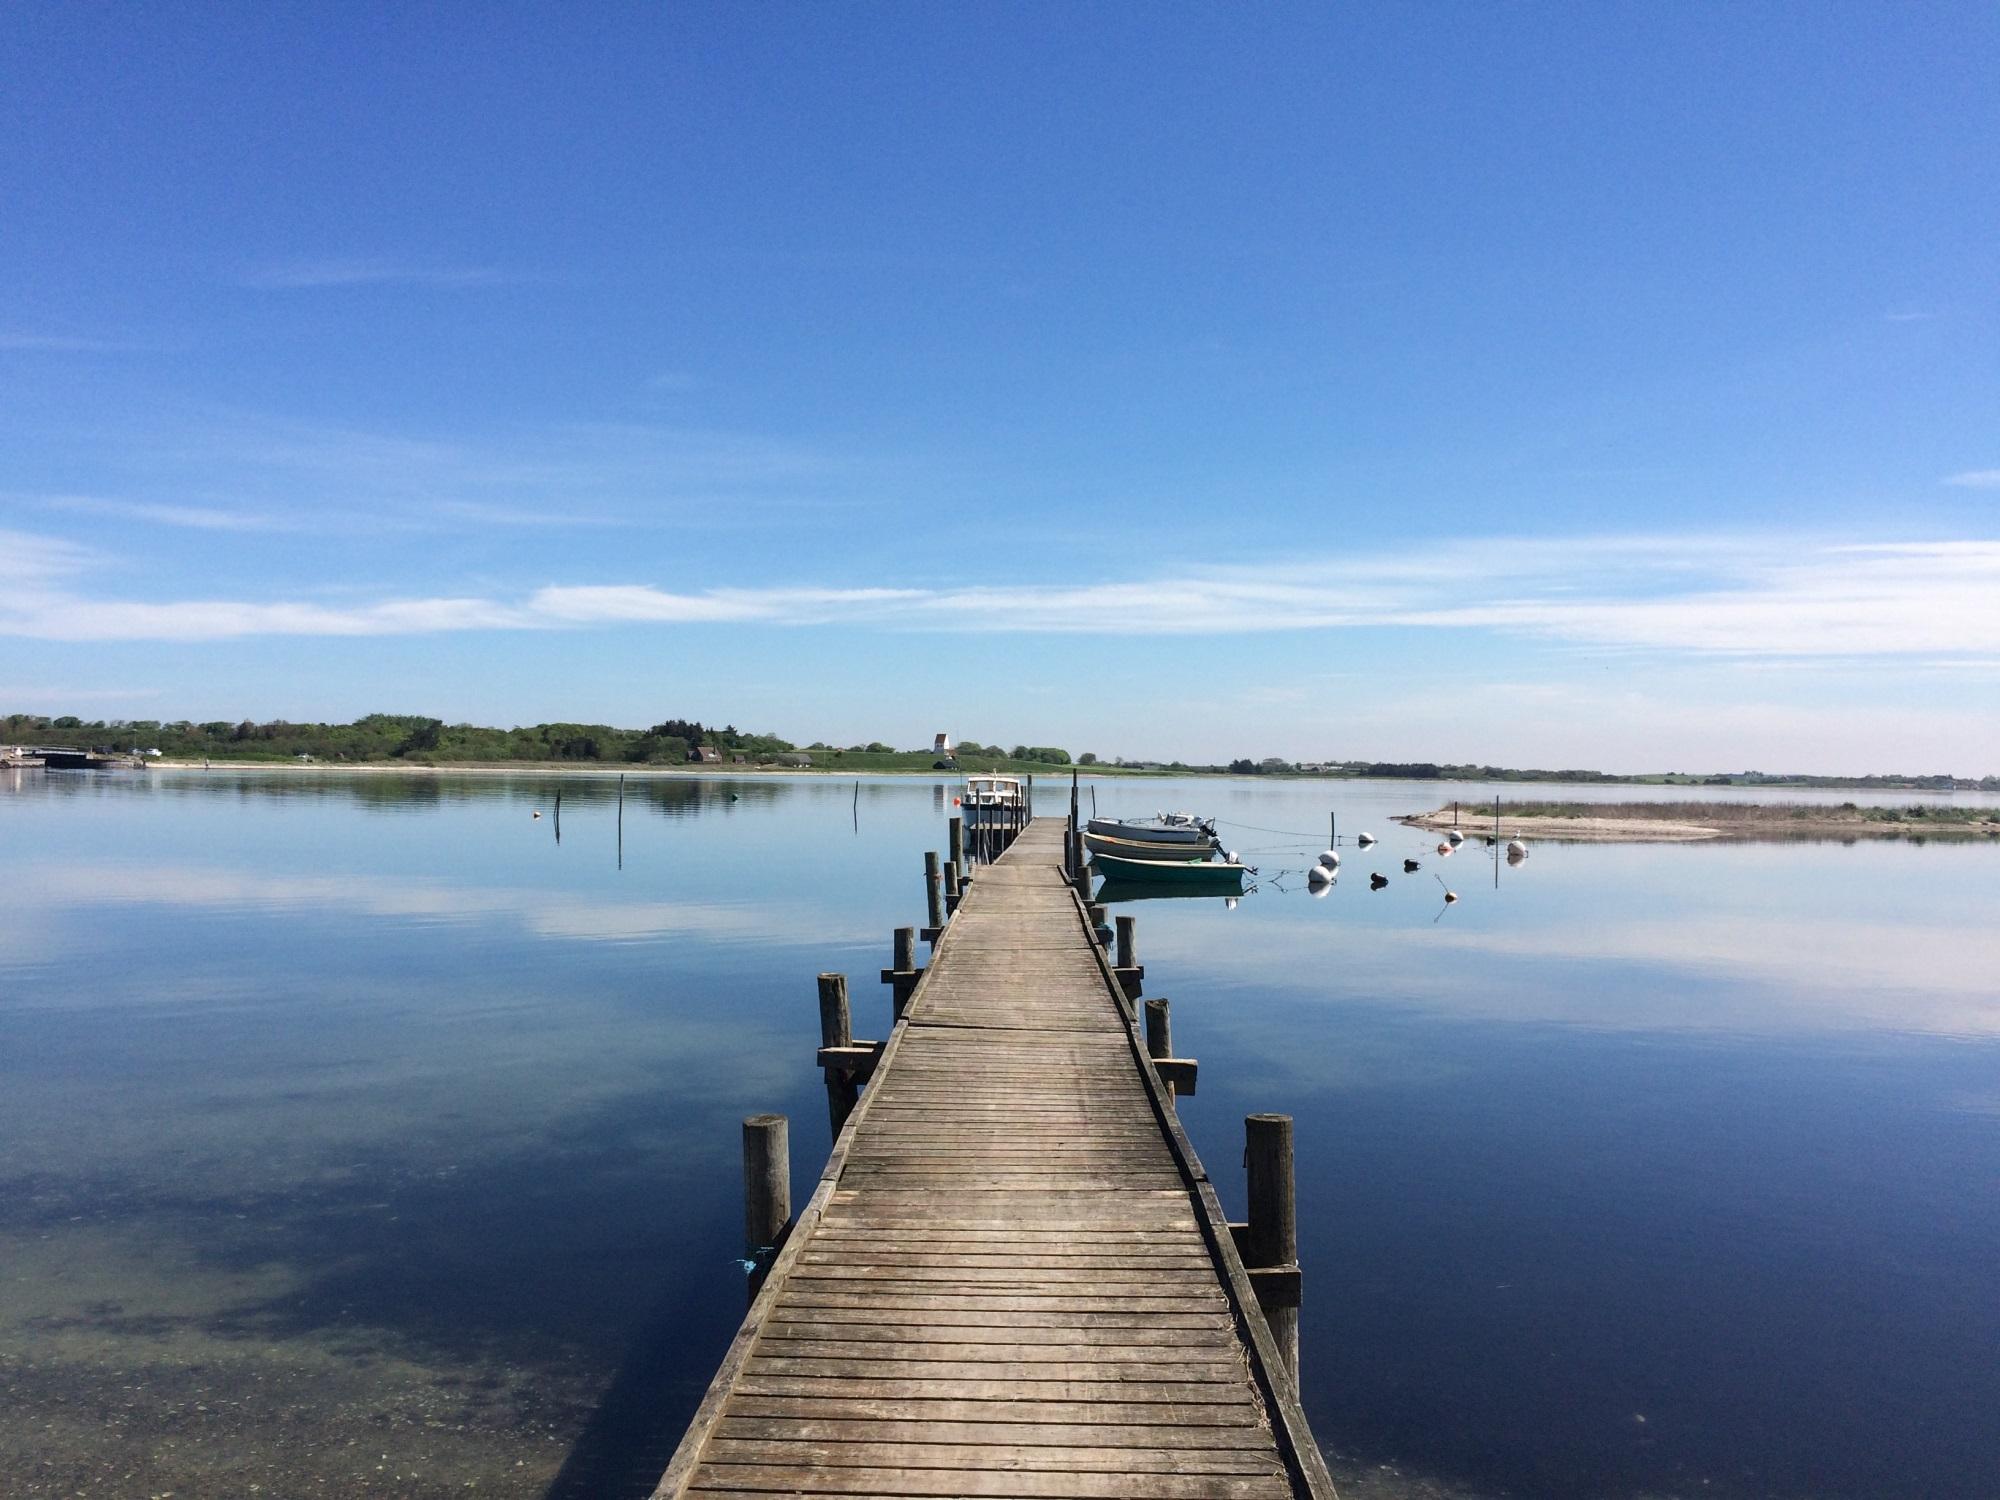 Danske smørhuller – InsiderTipps für Dänemark #12 Thyholm